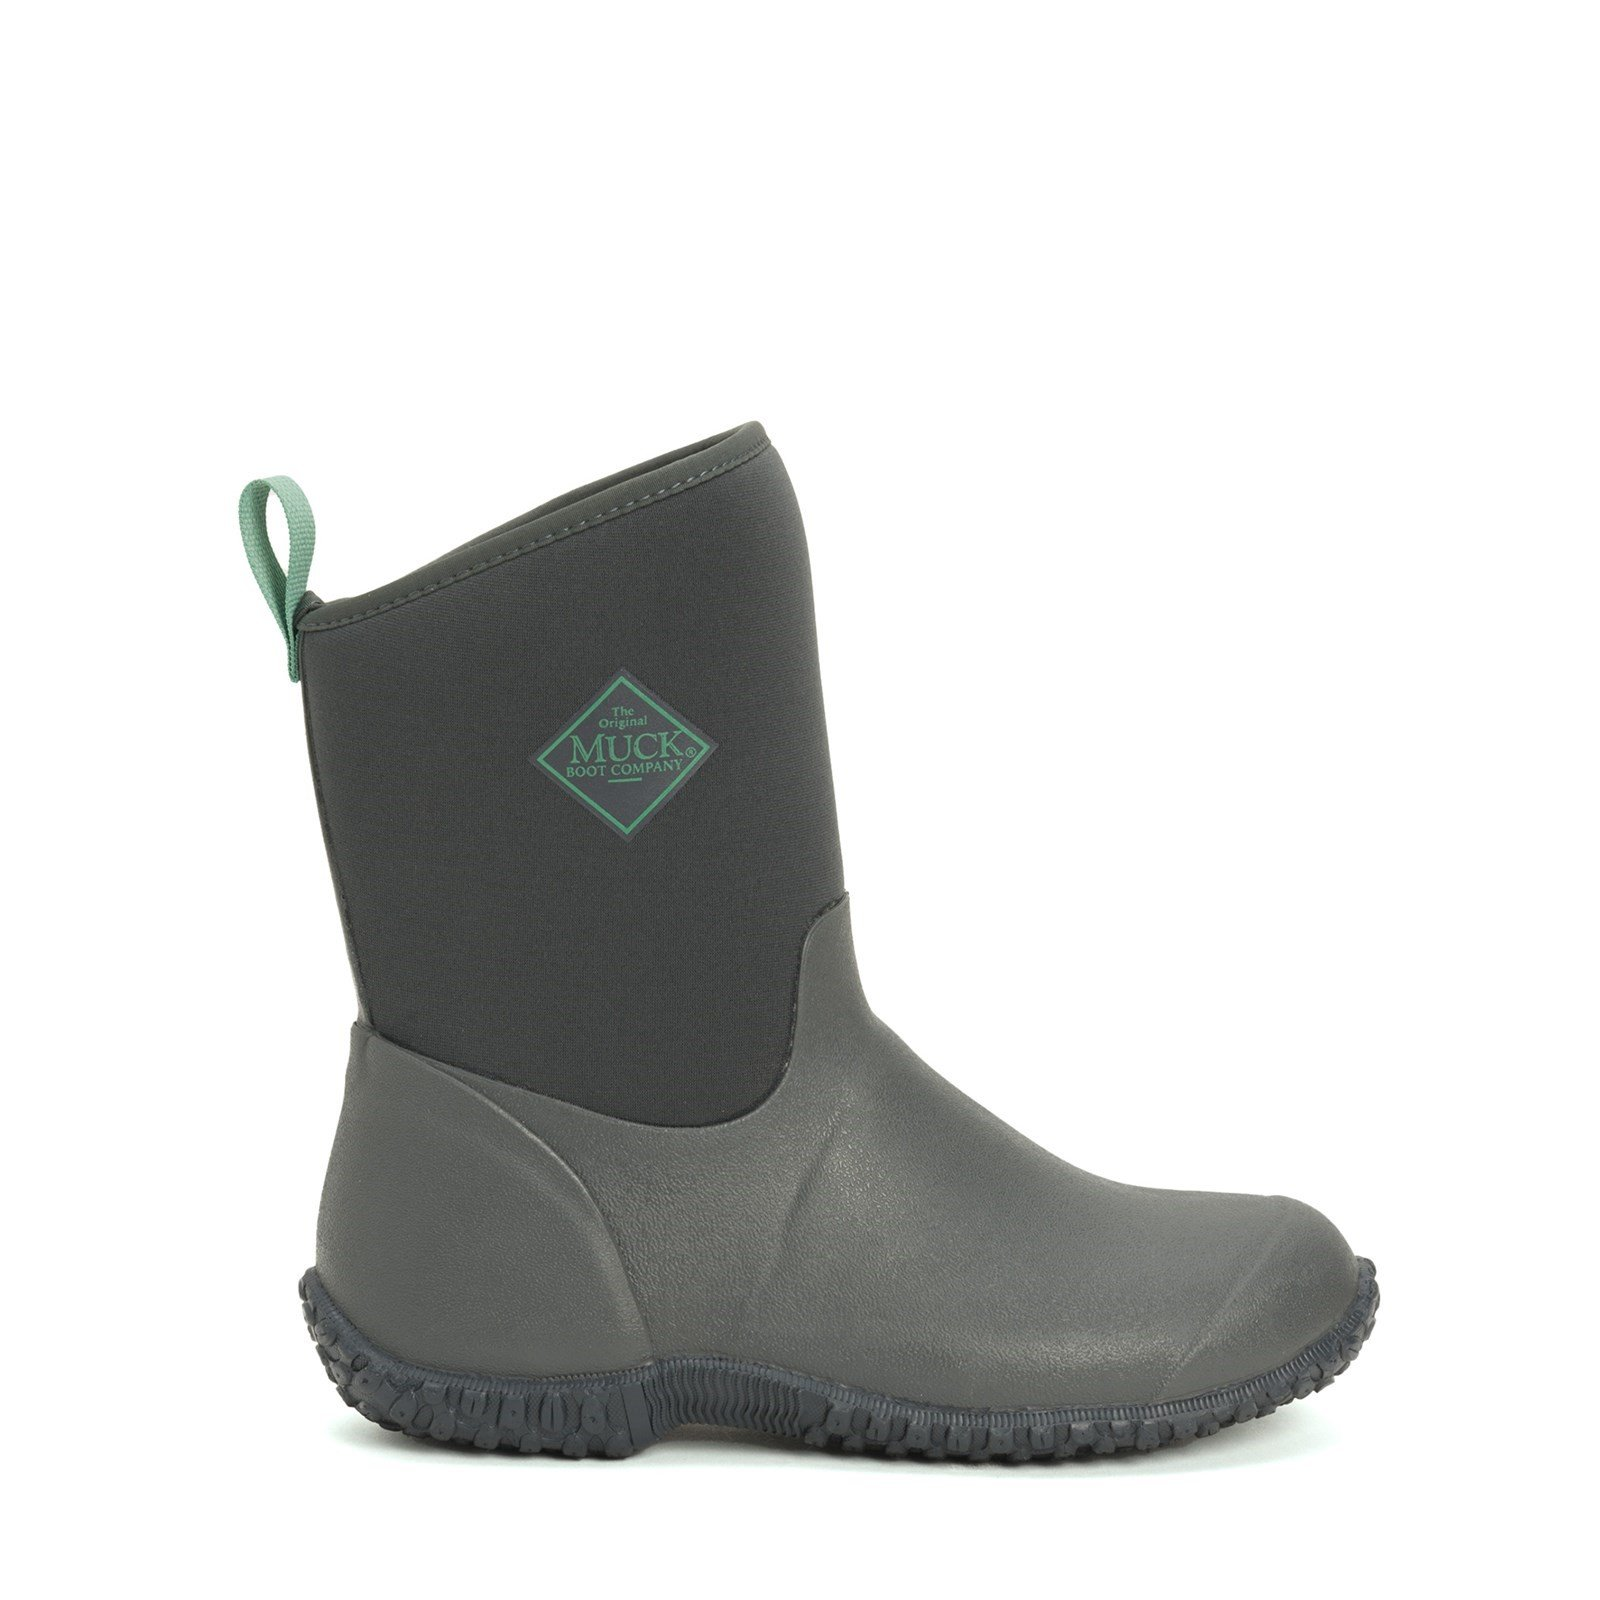 Muck Boots Women's Muckster II Slip On Short Boot Multicolor 28899 - Grey/Print 5